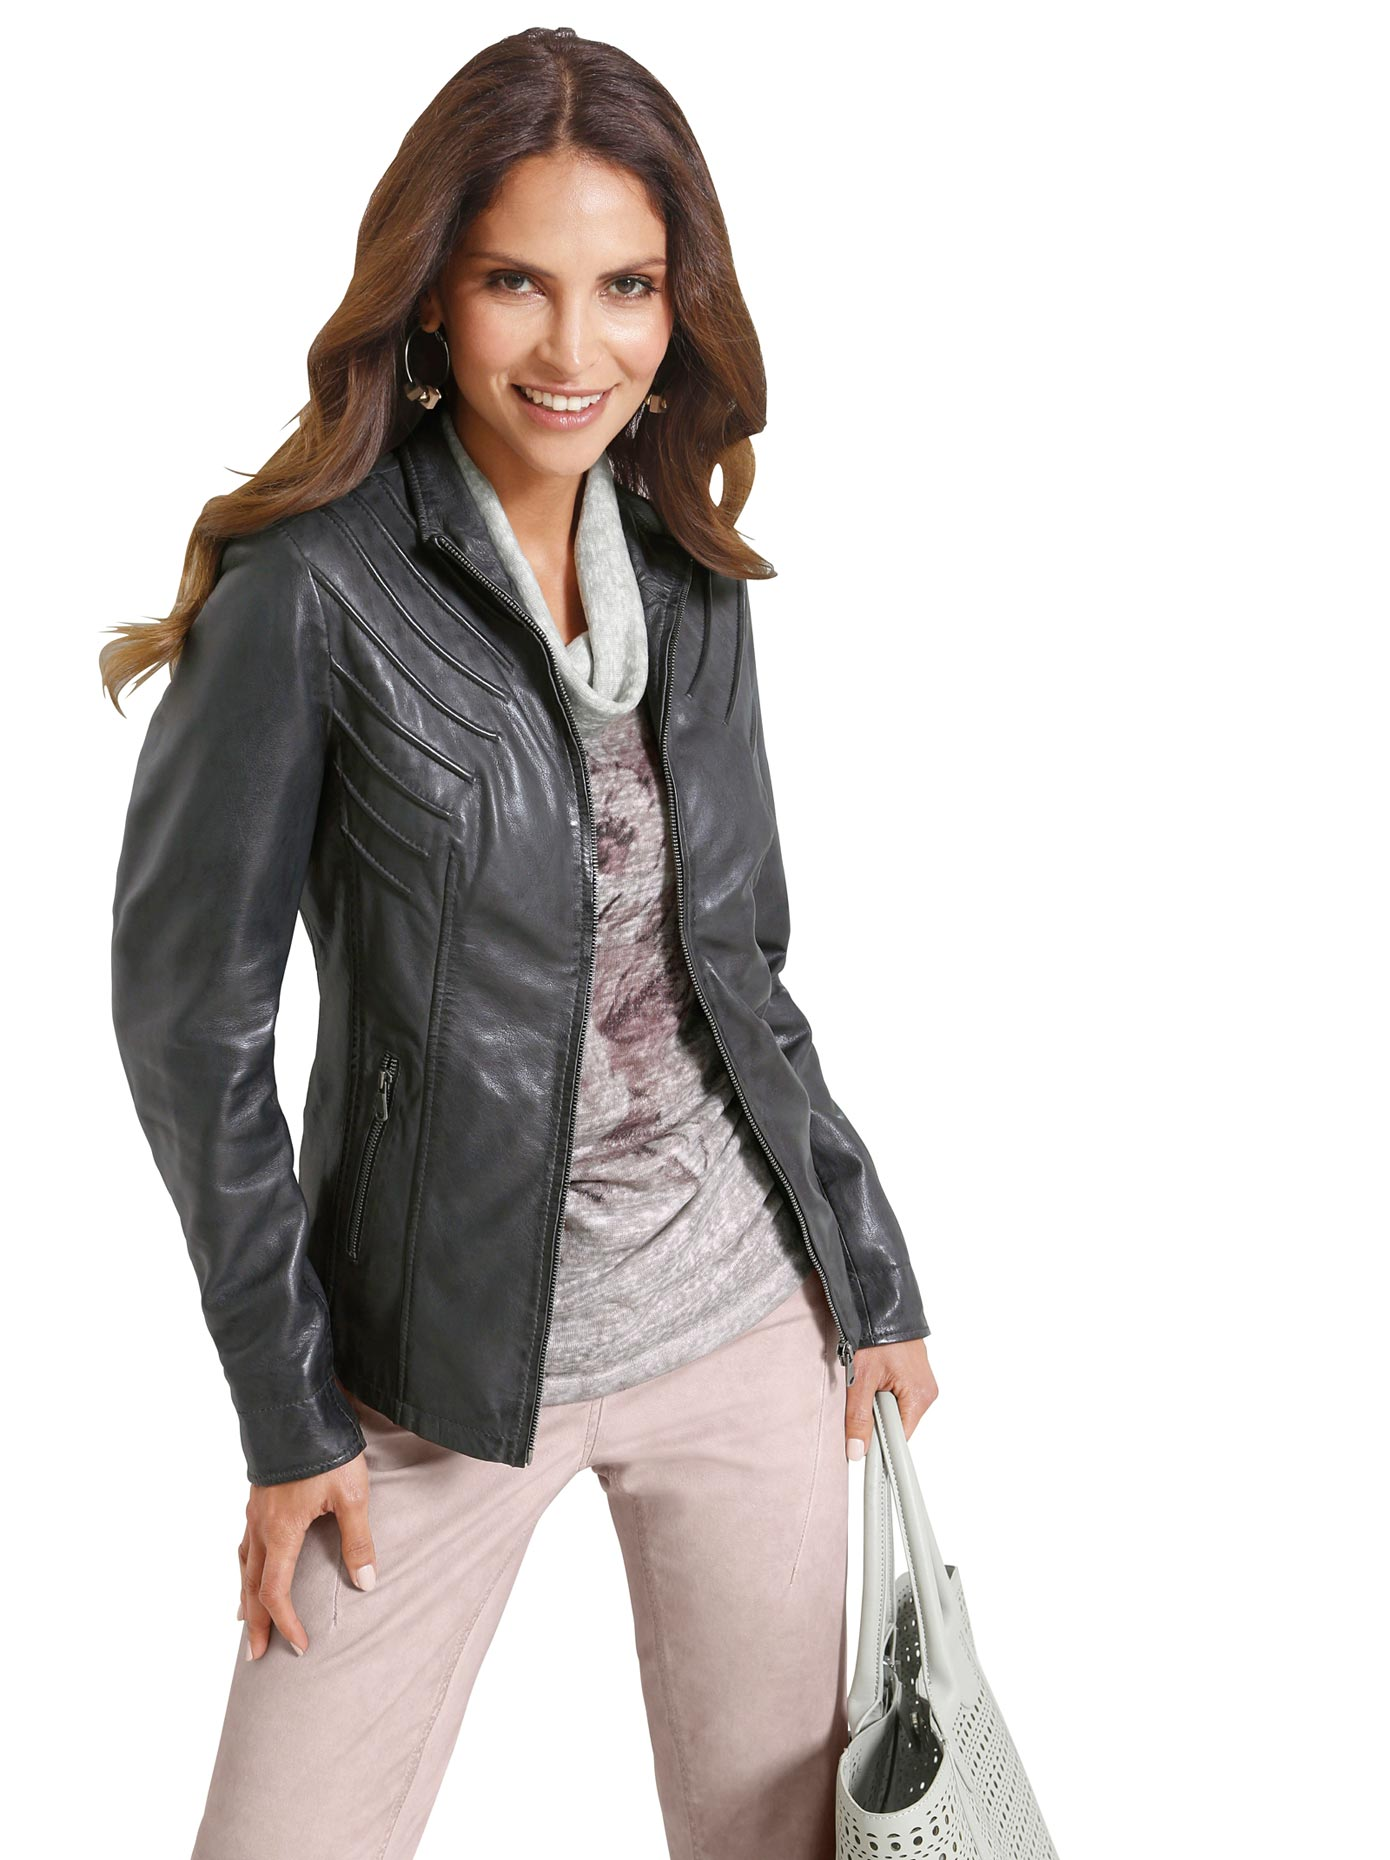 Image of Classic Inspirationen Leder-Jacke aus weichem Lamm-Nappa